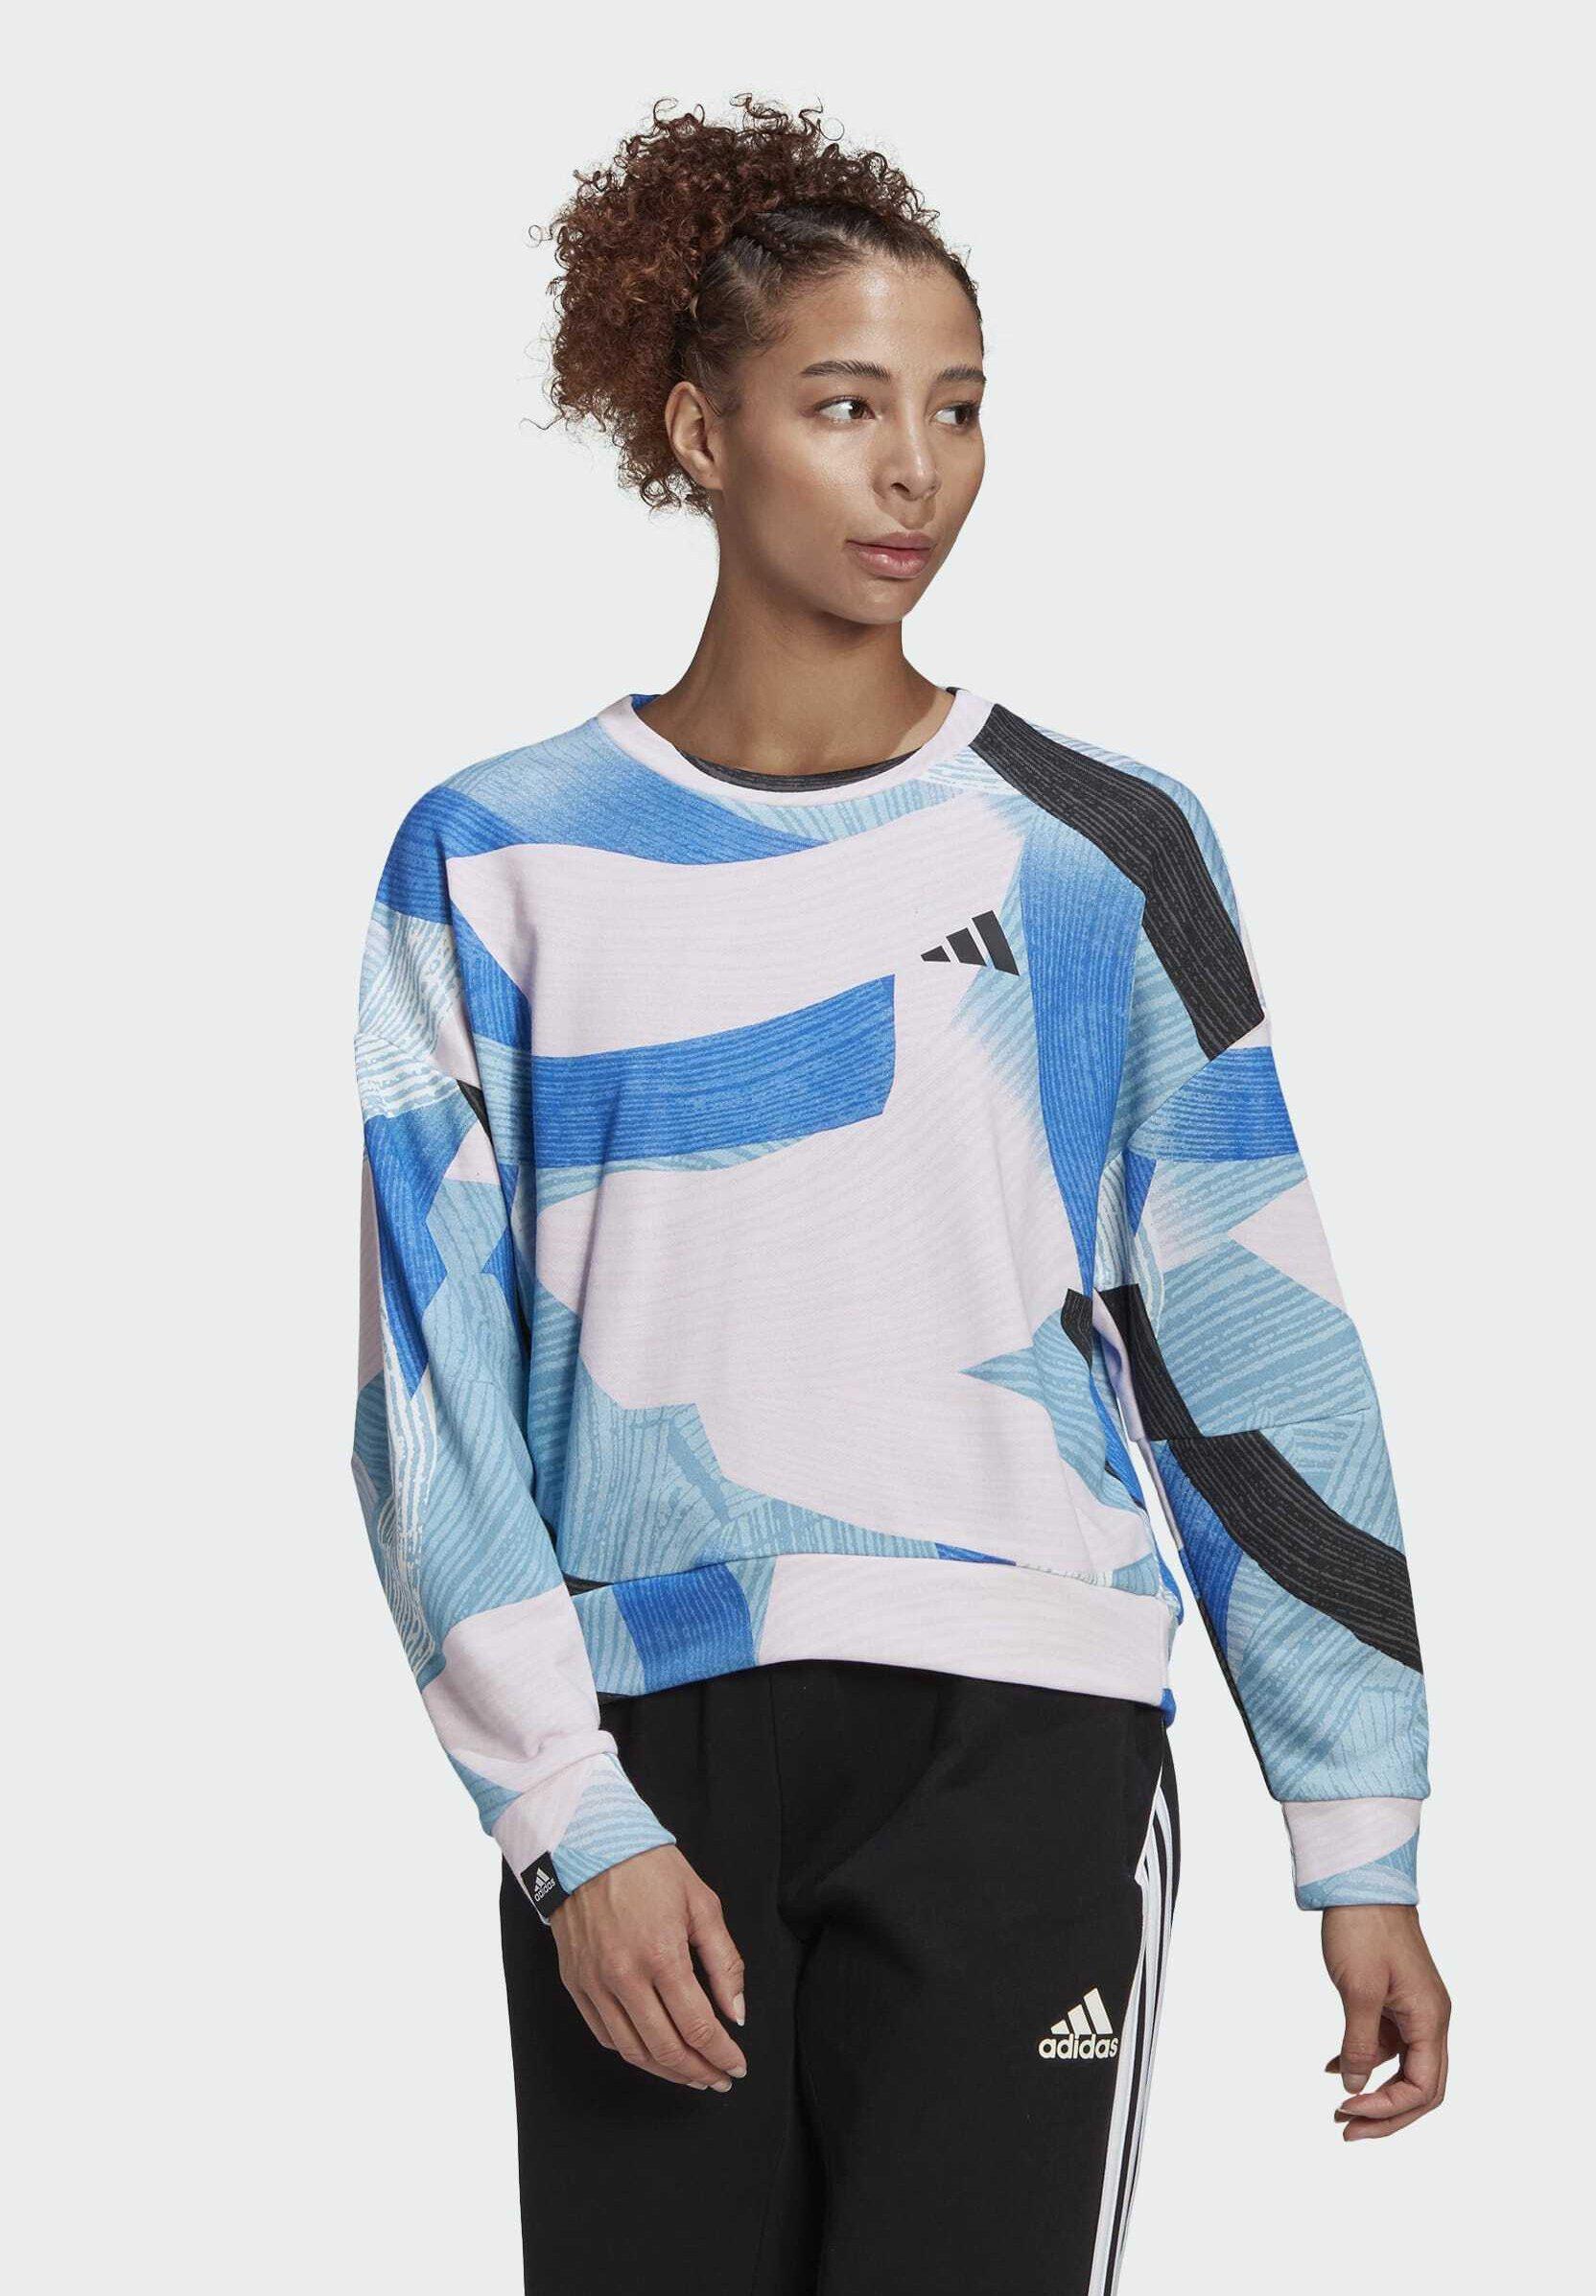 Women ADIDAS SPORTSWEAR NINI SUM GRAPHIC SWEATSHIRT - Sweatshirt